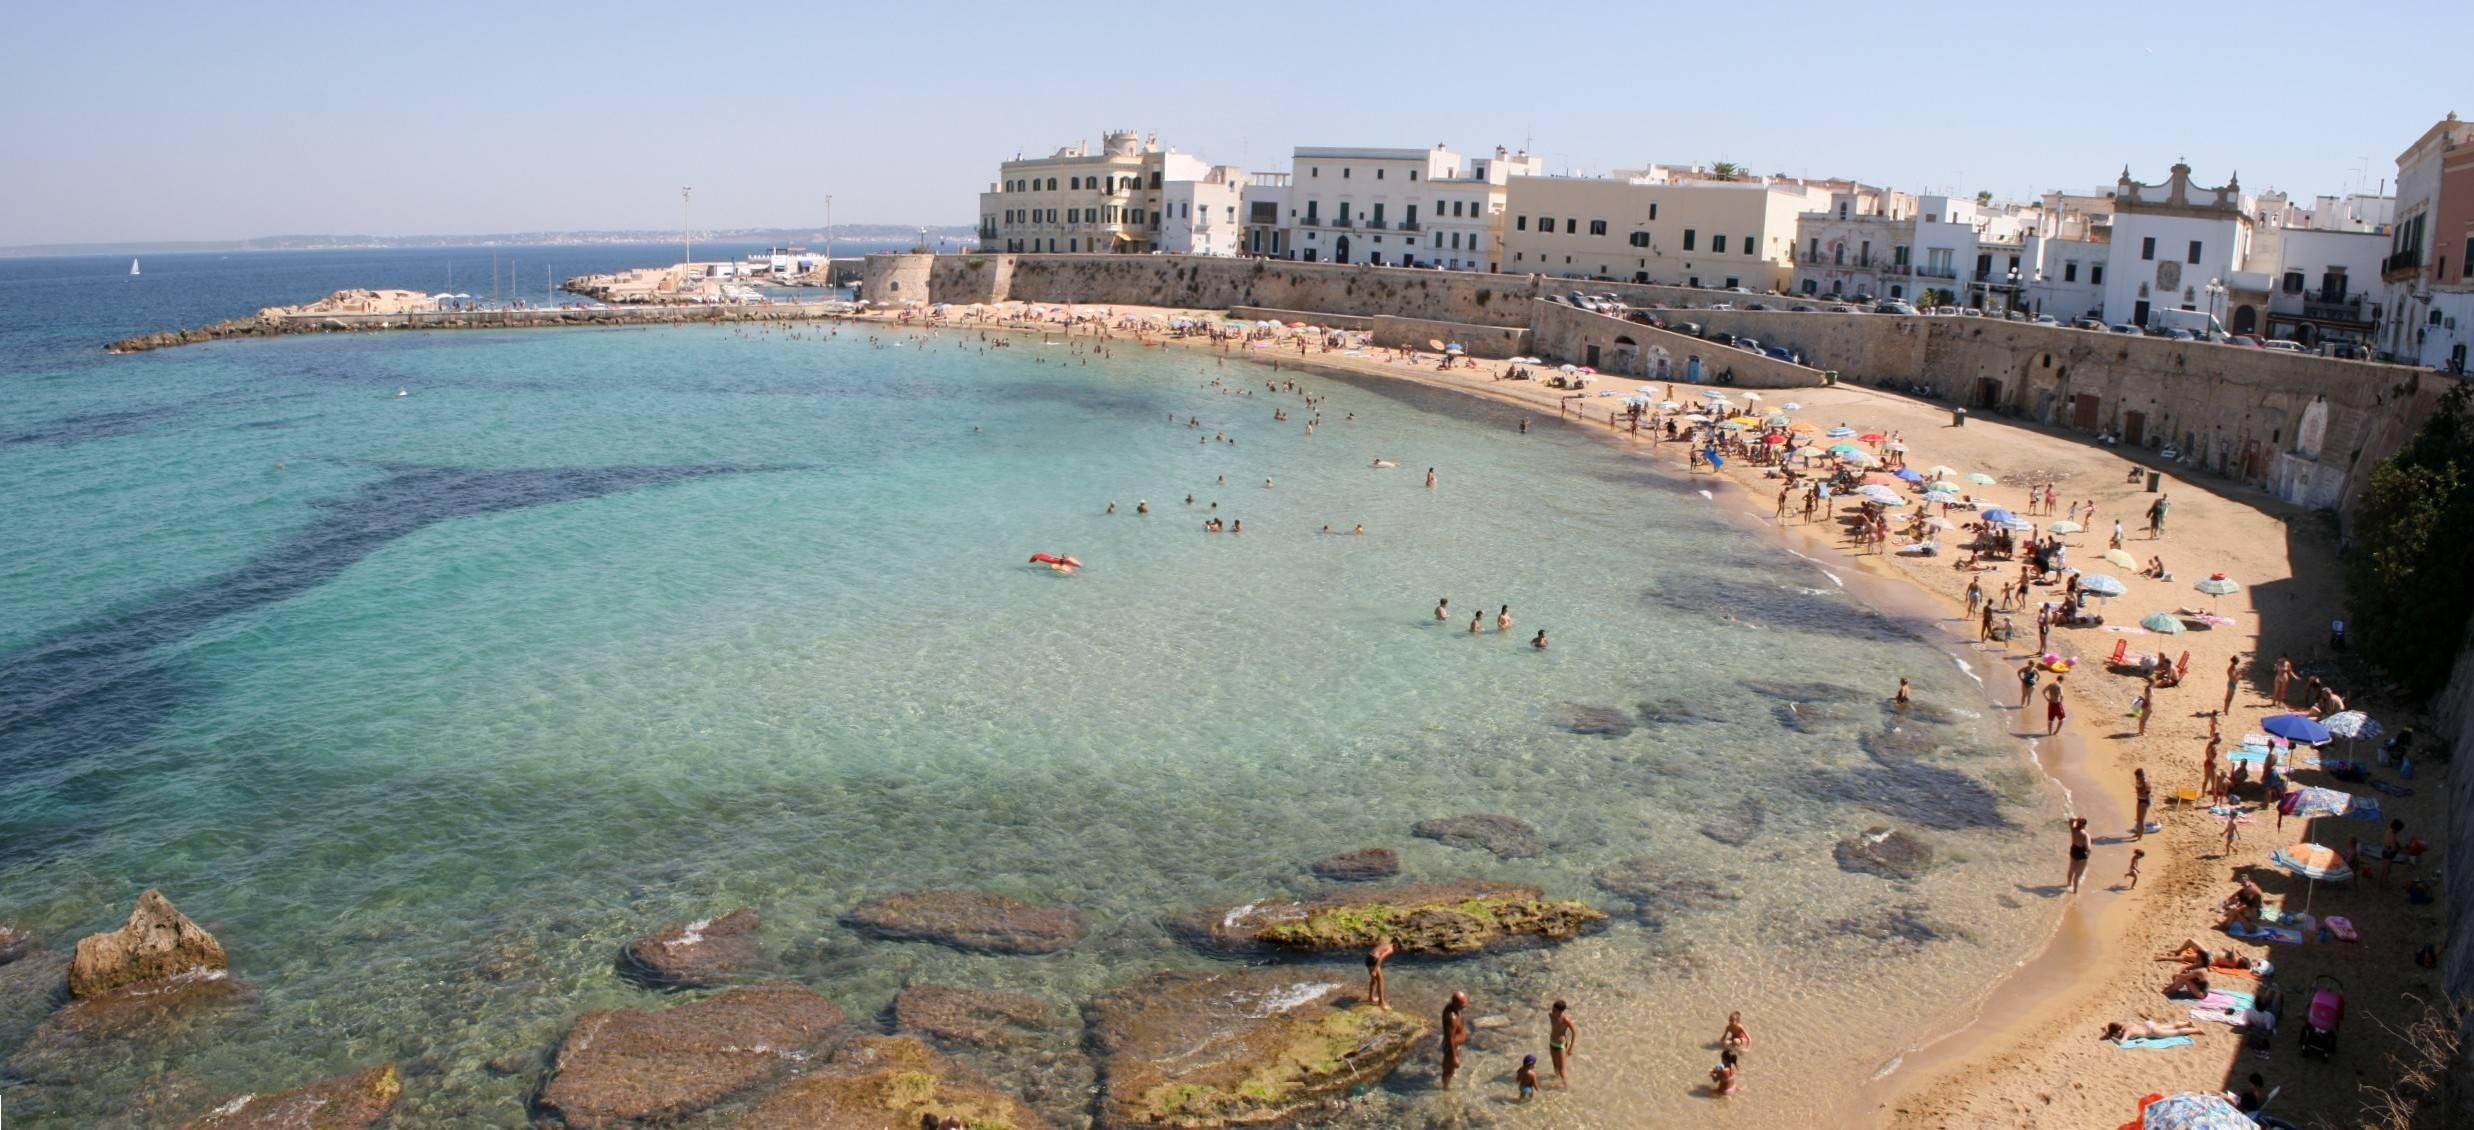 Truffa online, affittavano case inesistenti ai turisti: 22 arrestati